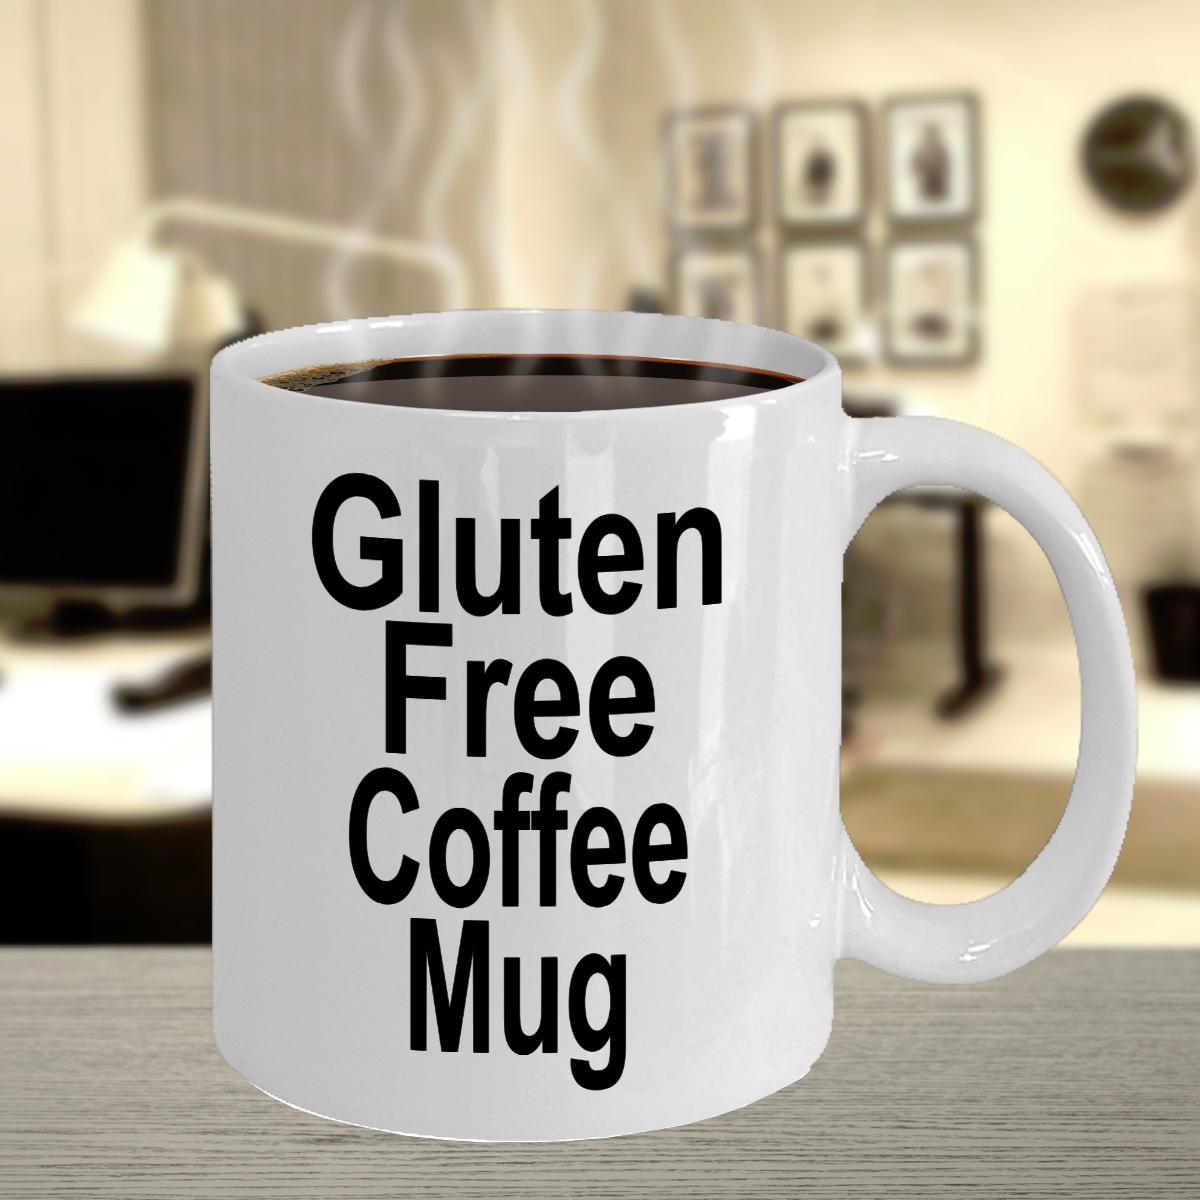 Gluten Free Coffee Mug Funny Ceramic Mug